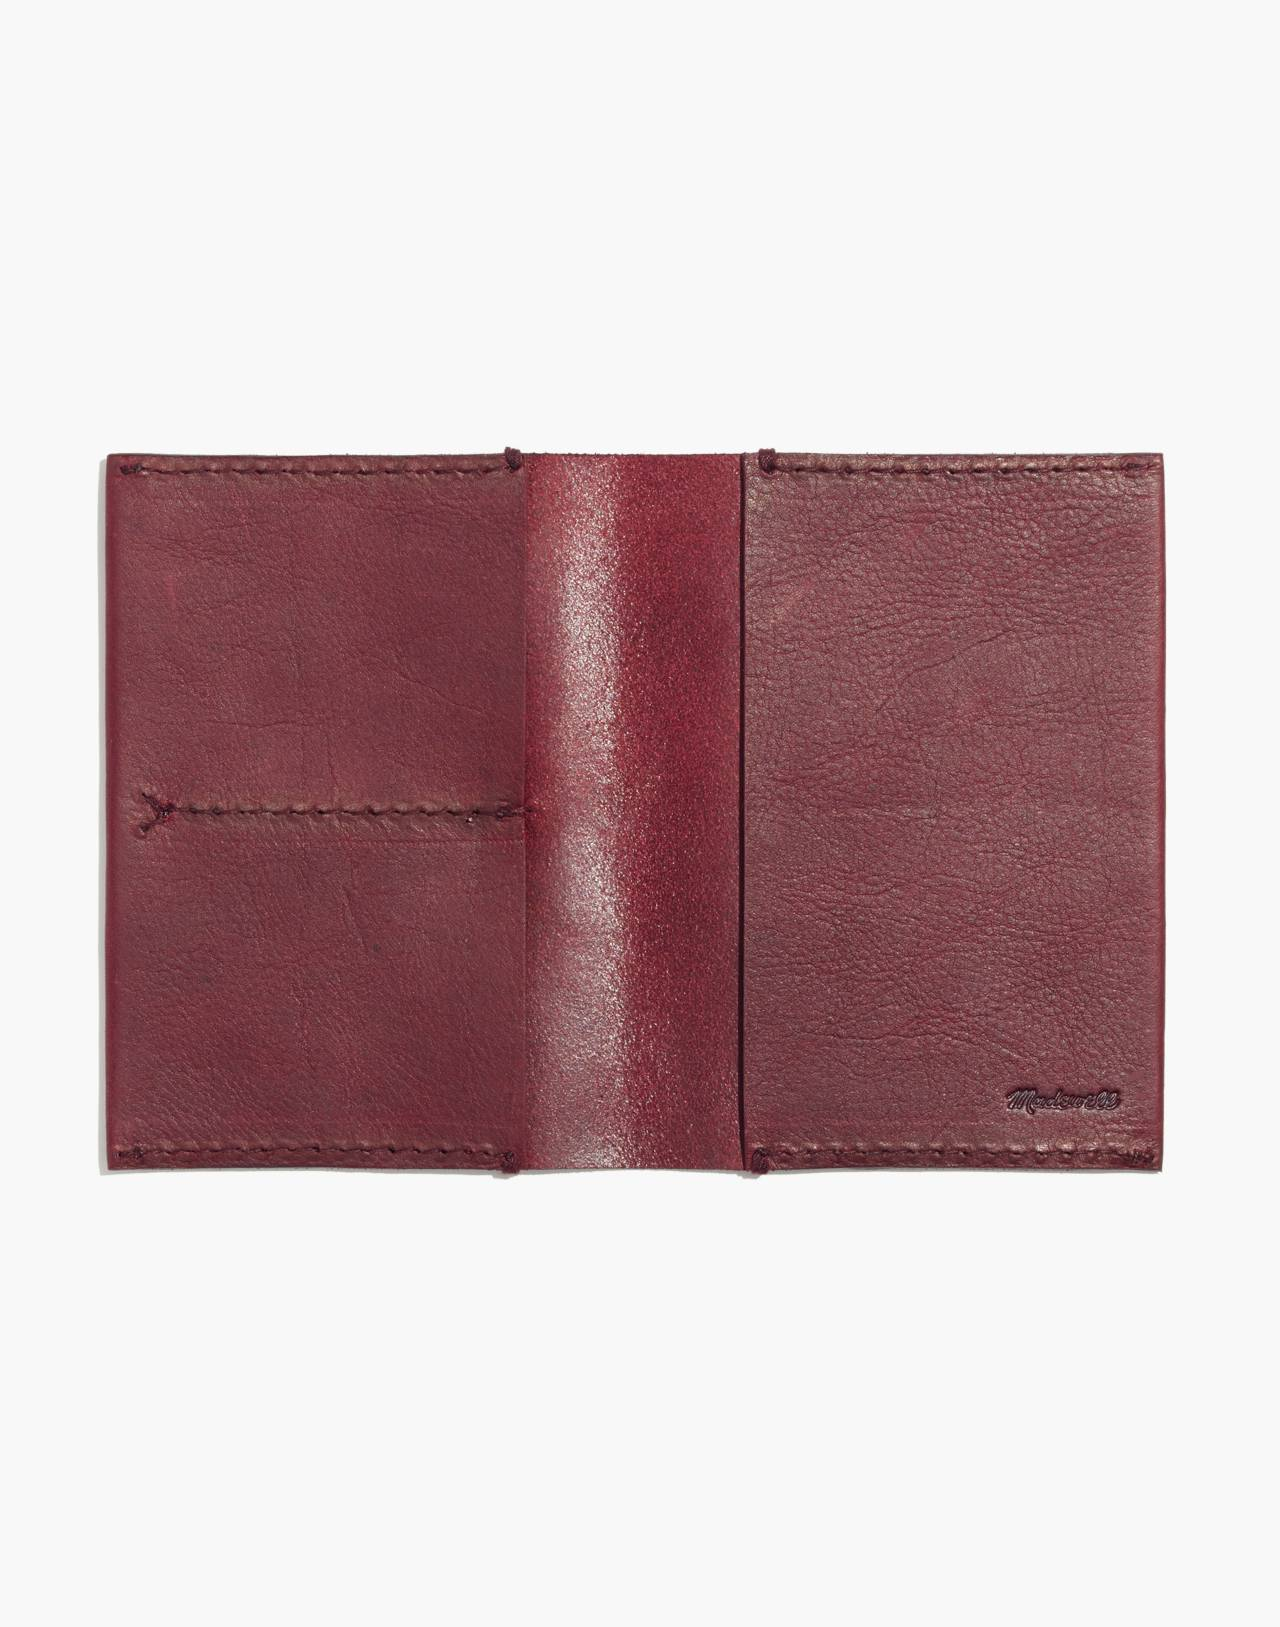 The Leather Passport Case in dark cabernet image 2